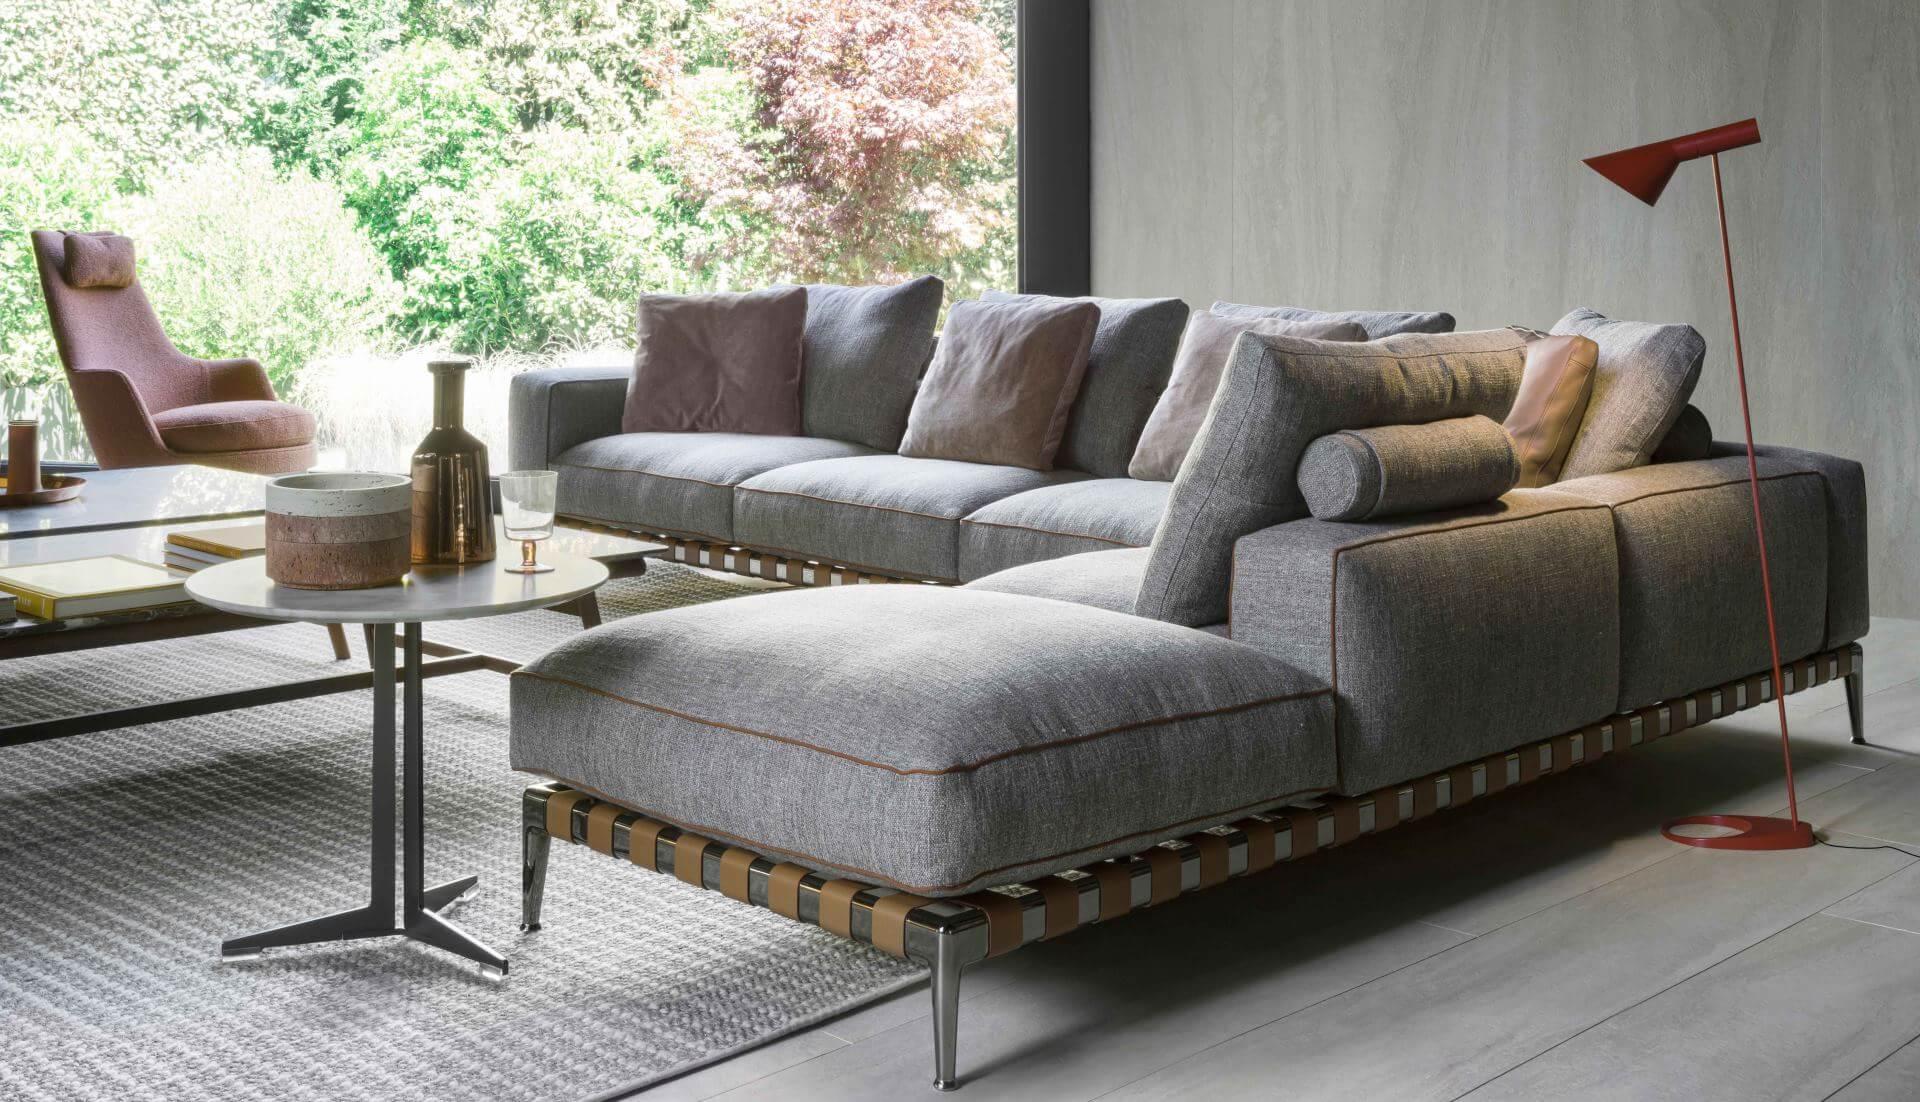 Flexform Gregory Modular Sofa - Dream Design Interiors Ltd